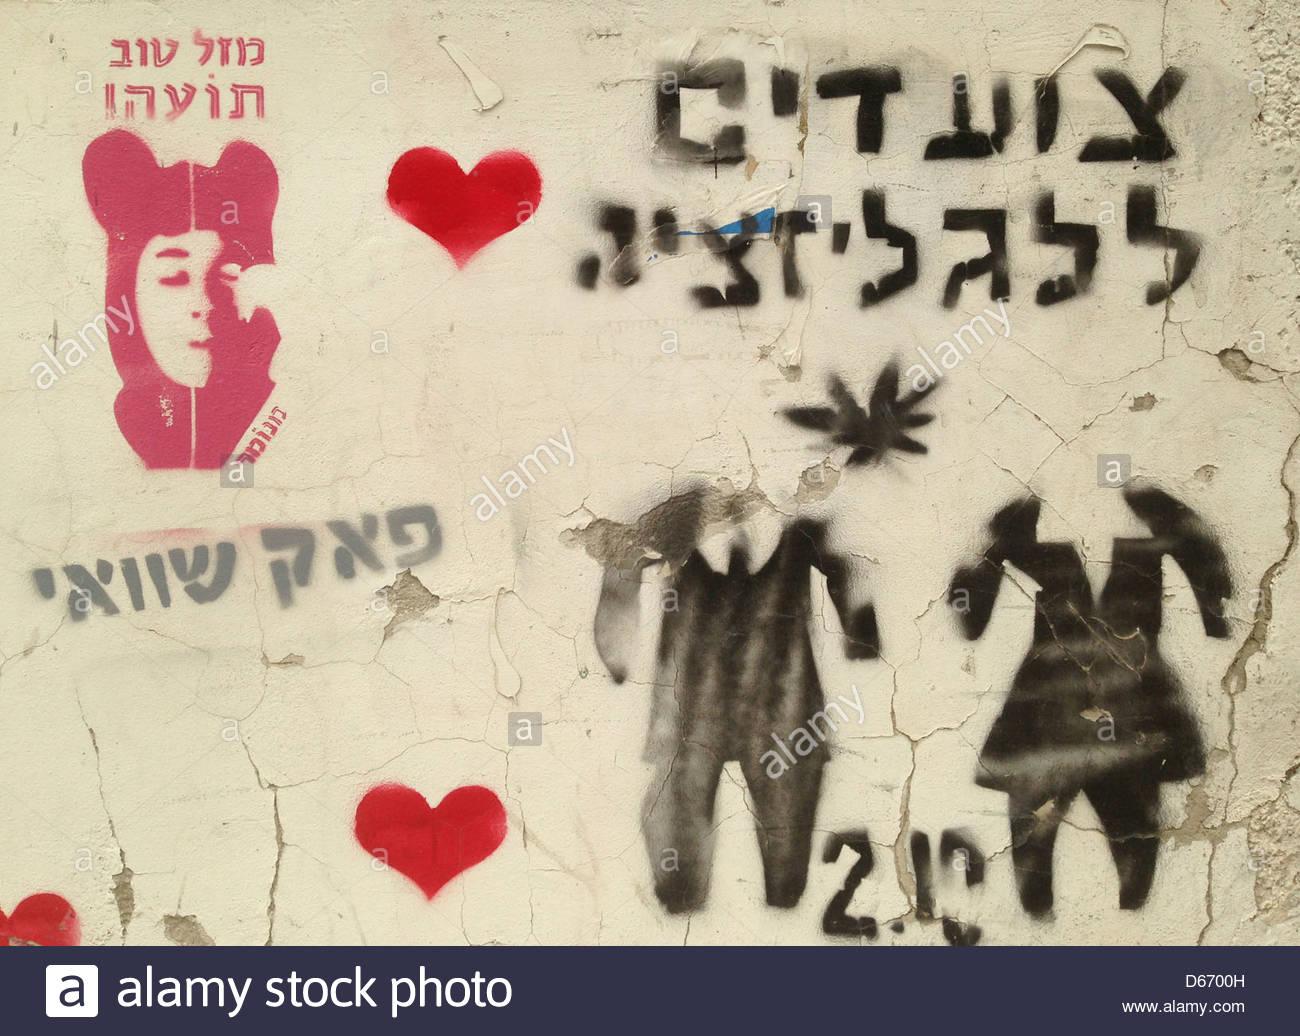 Graffiti shot with Iphone 5 camera Israel - Stock Image